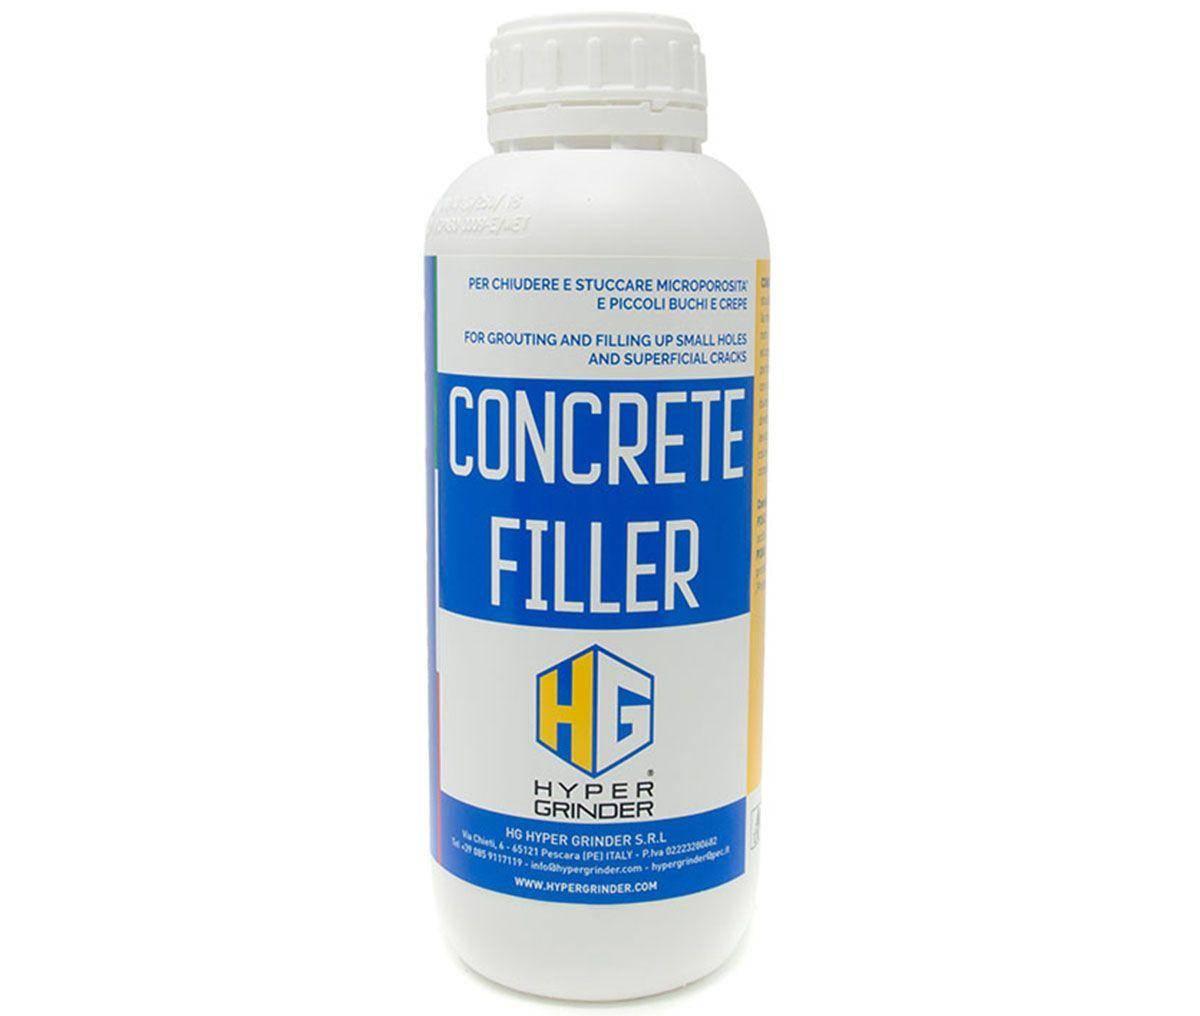 concrete filler 1429